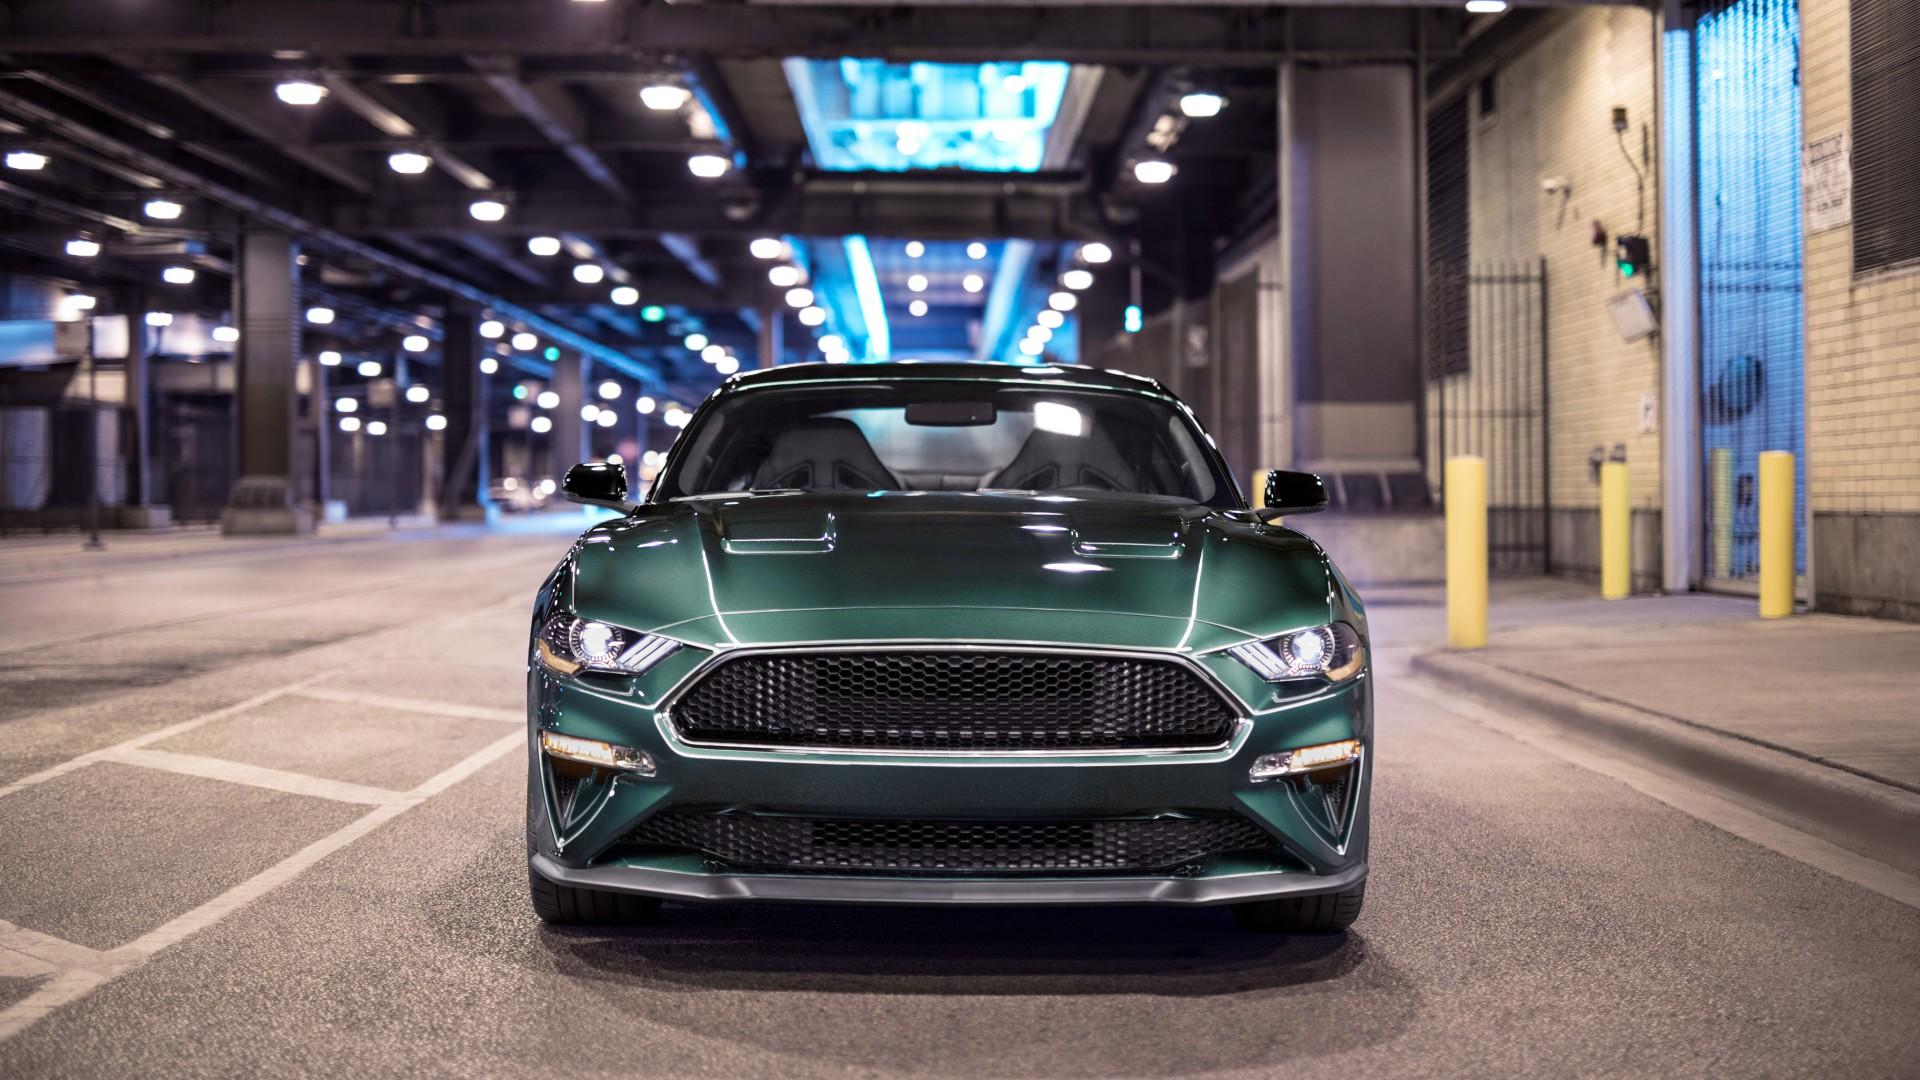 2018 Ford Mustang Bullitt 4K Wallpaper   HD Car Wallpapers ...